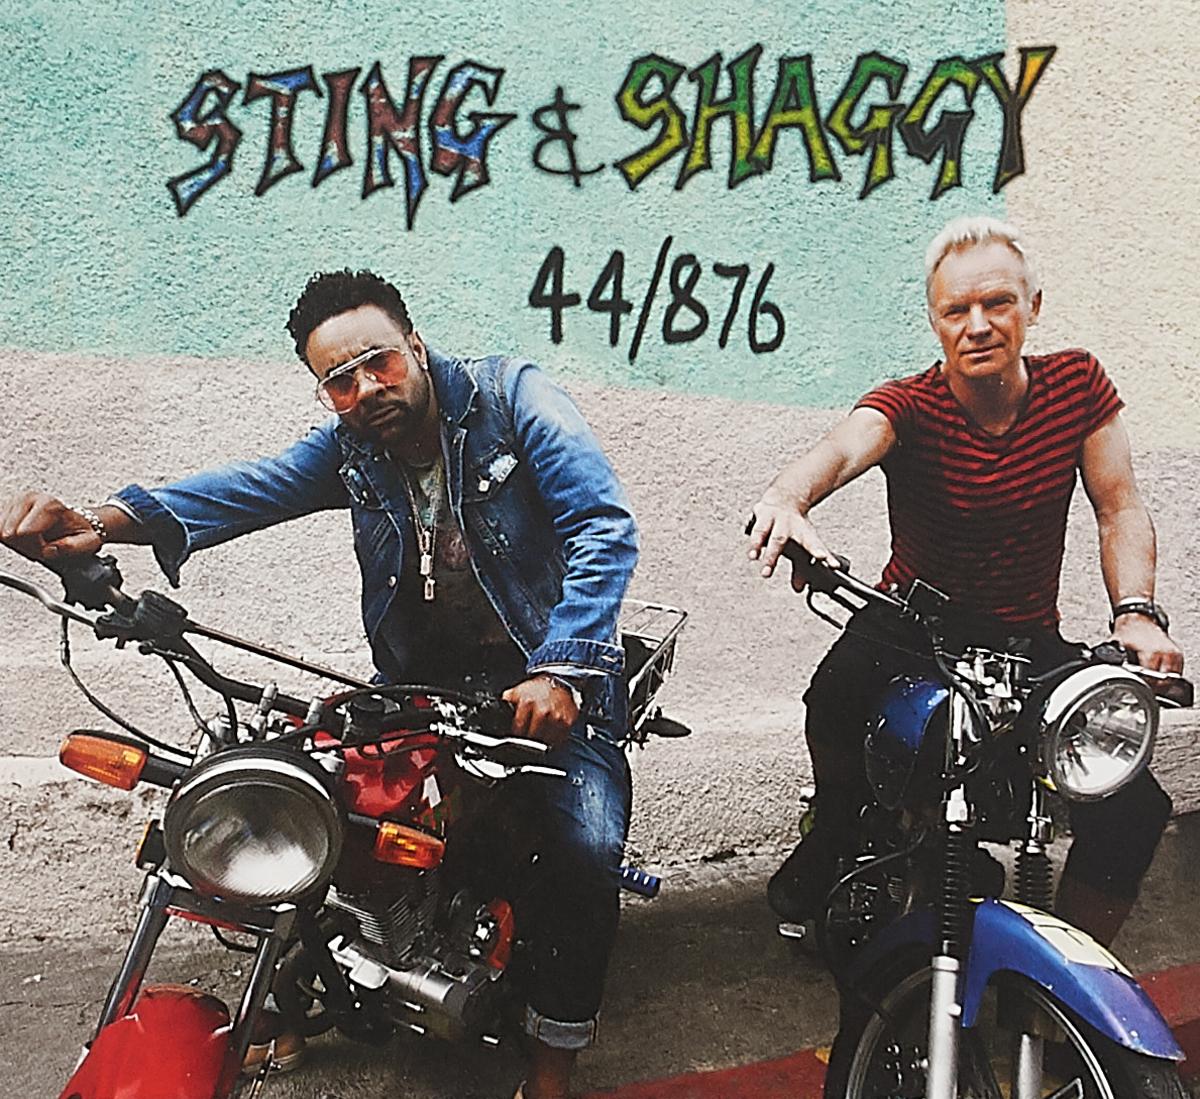 лучшая цена Sting Sting. 44/876 - Deluxe